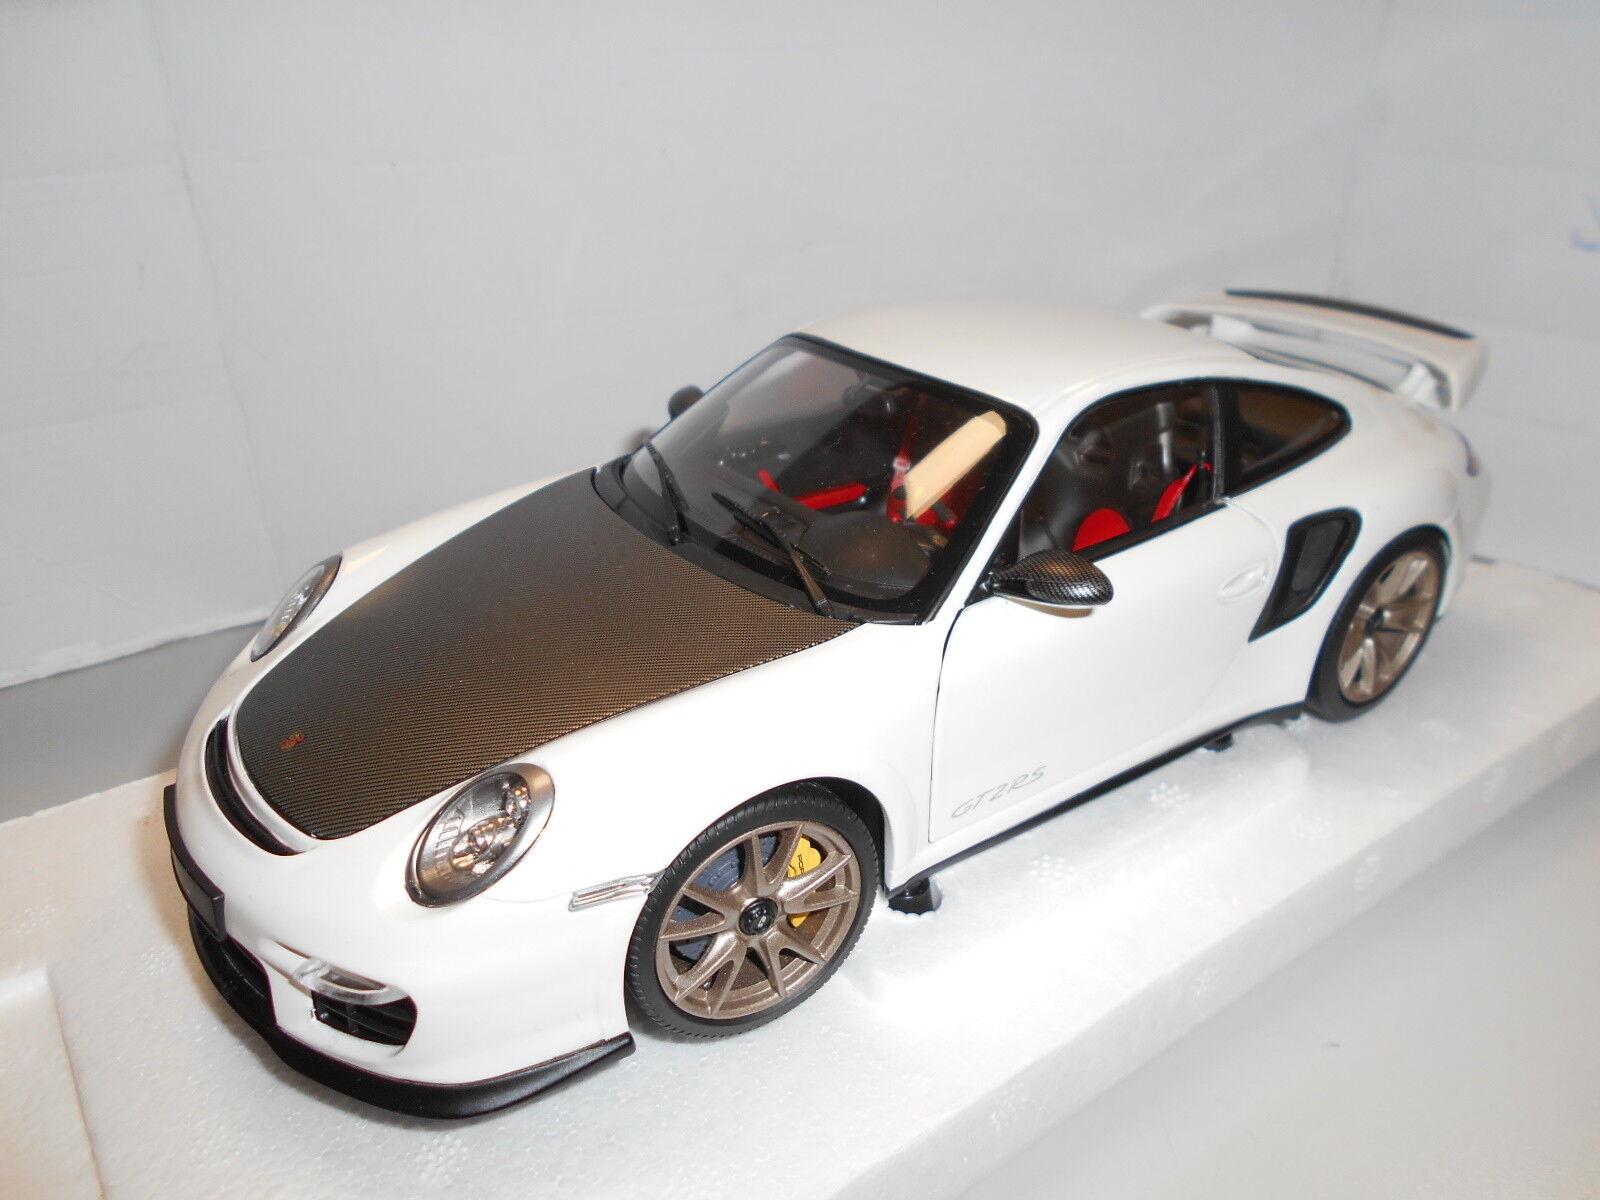 Min100069400 by Minichamps Porsche 911 997-2 gt2 RS 2011 1 18